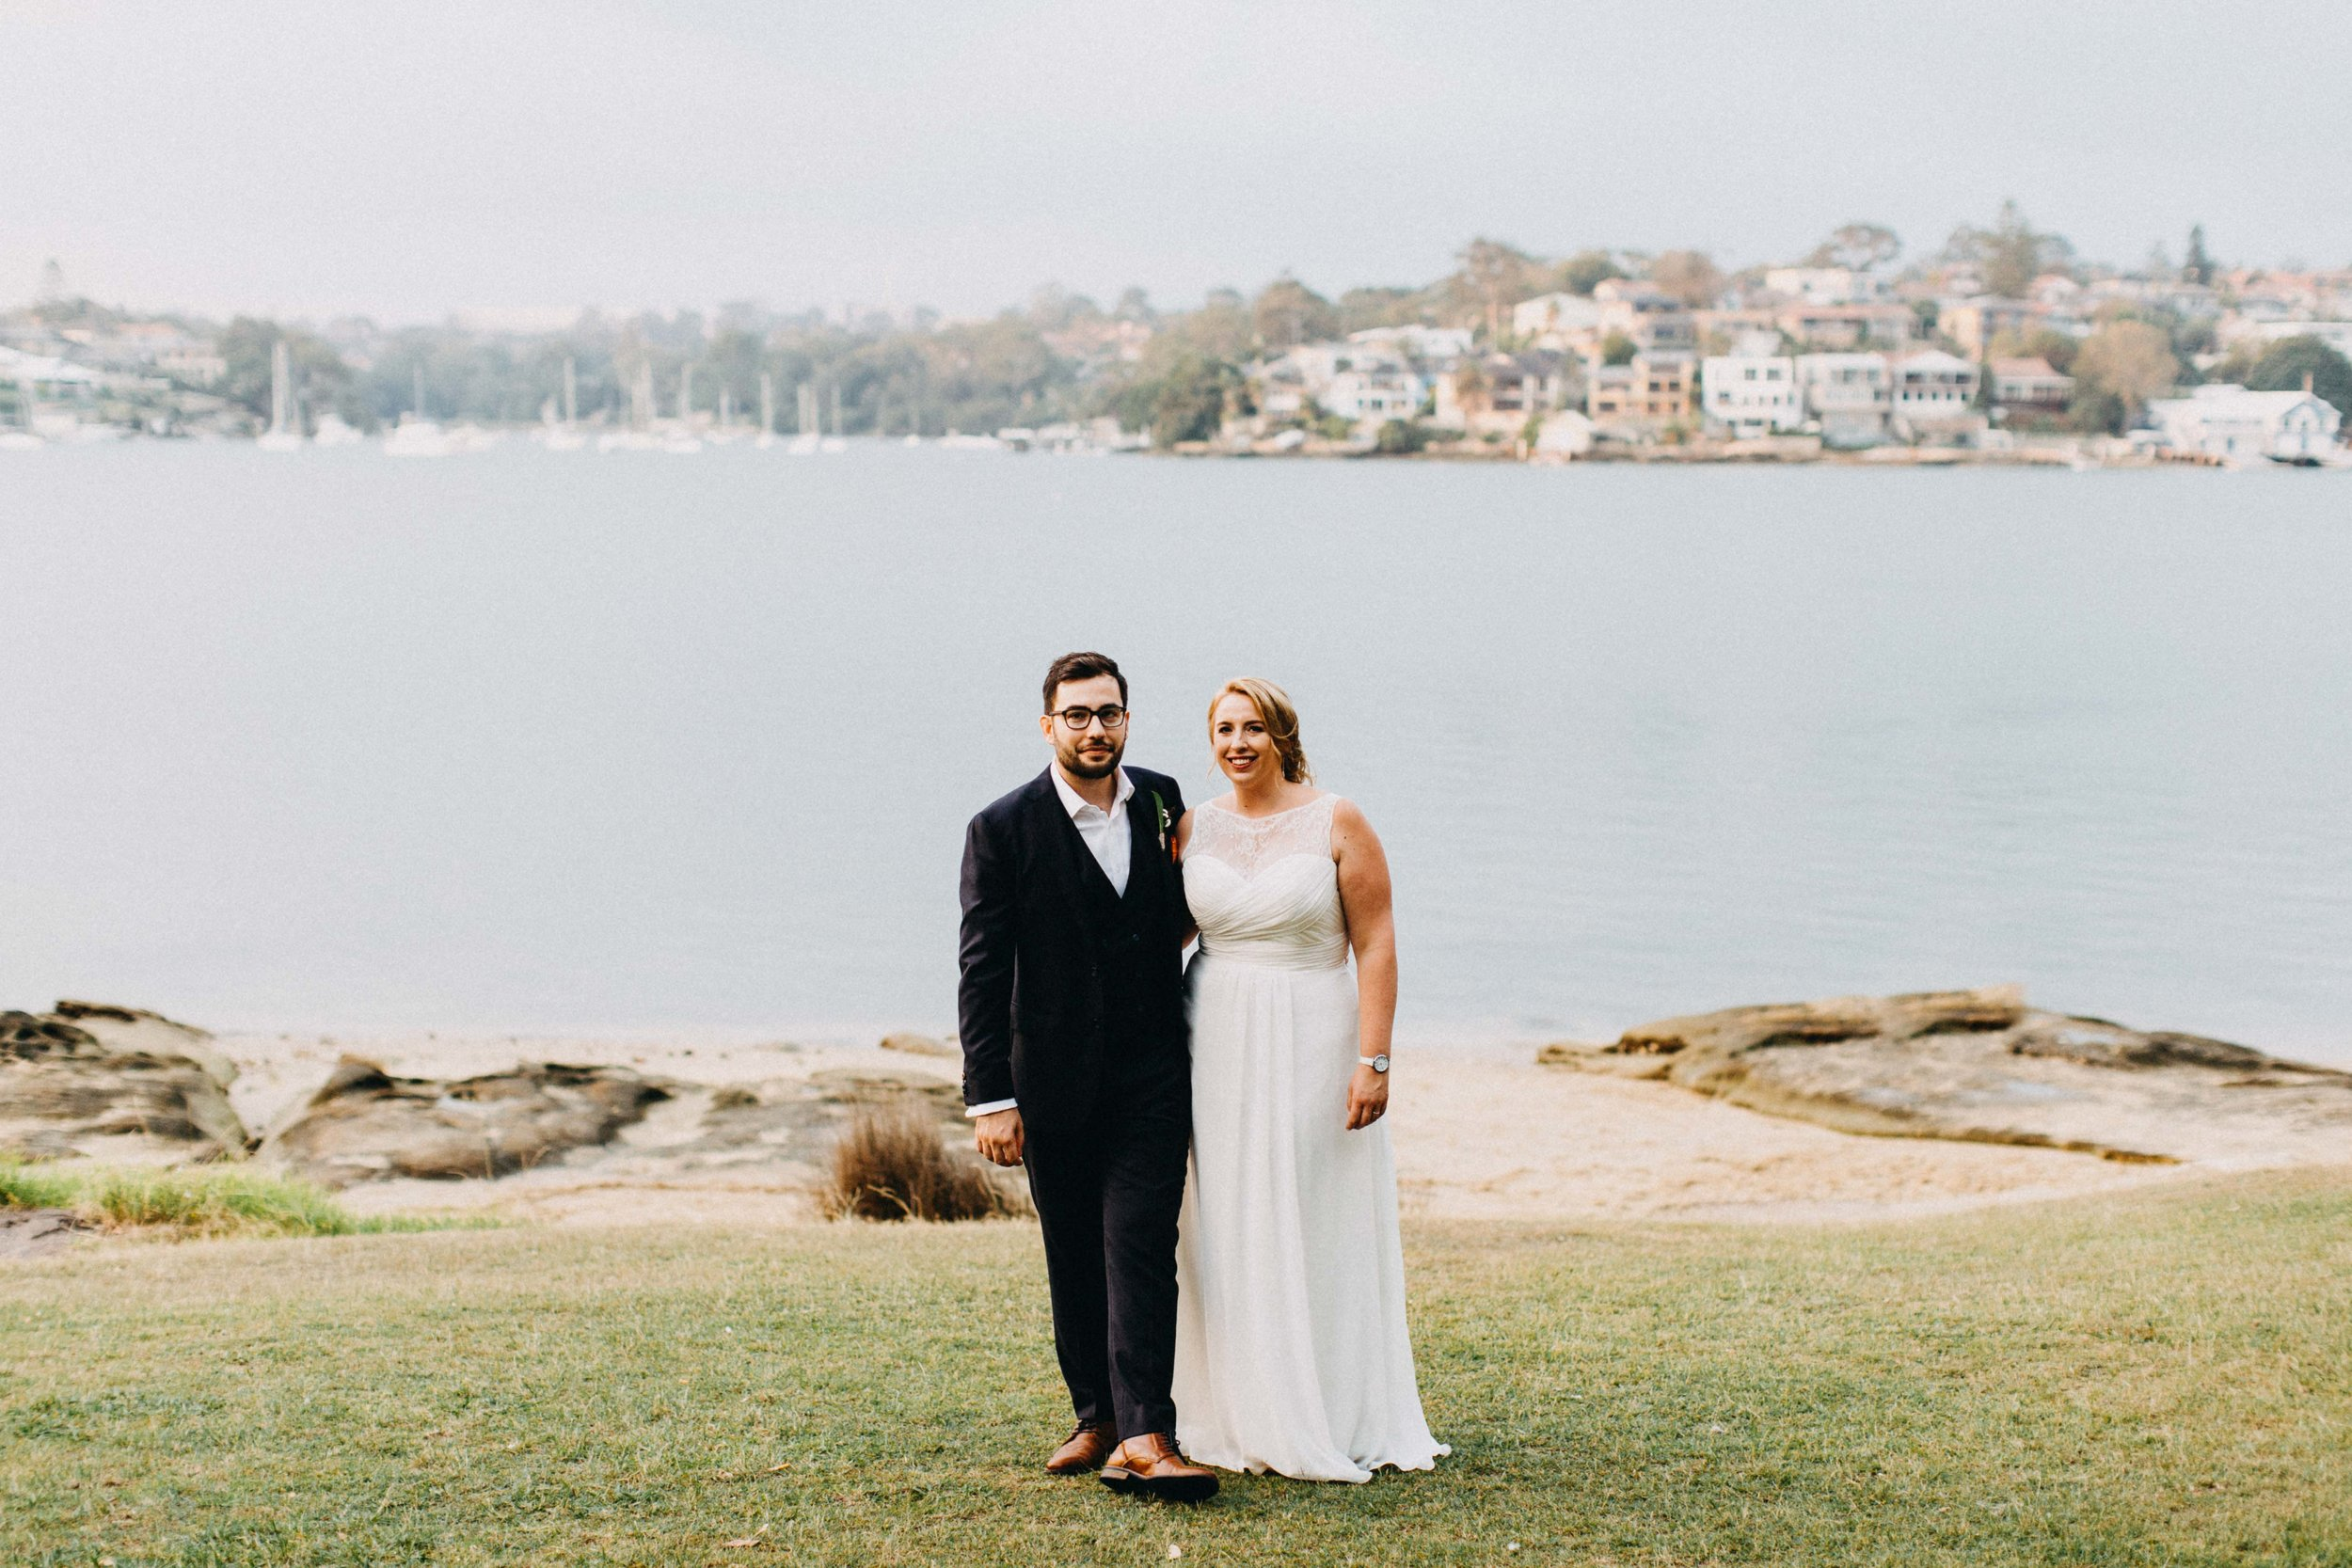 cabarita-park-sydney-wedding-emilyobrienphotography.net-60.jpg